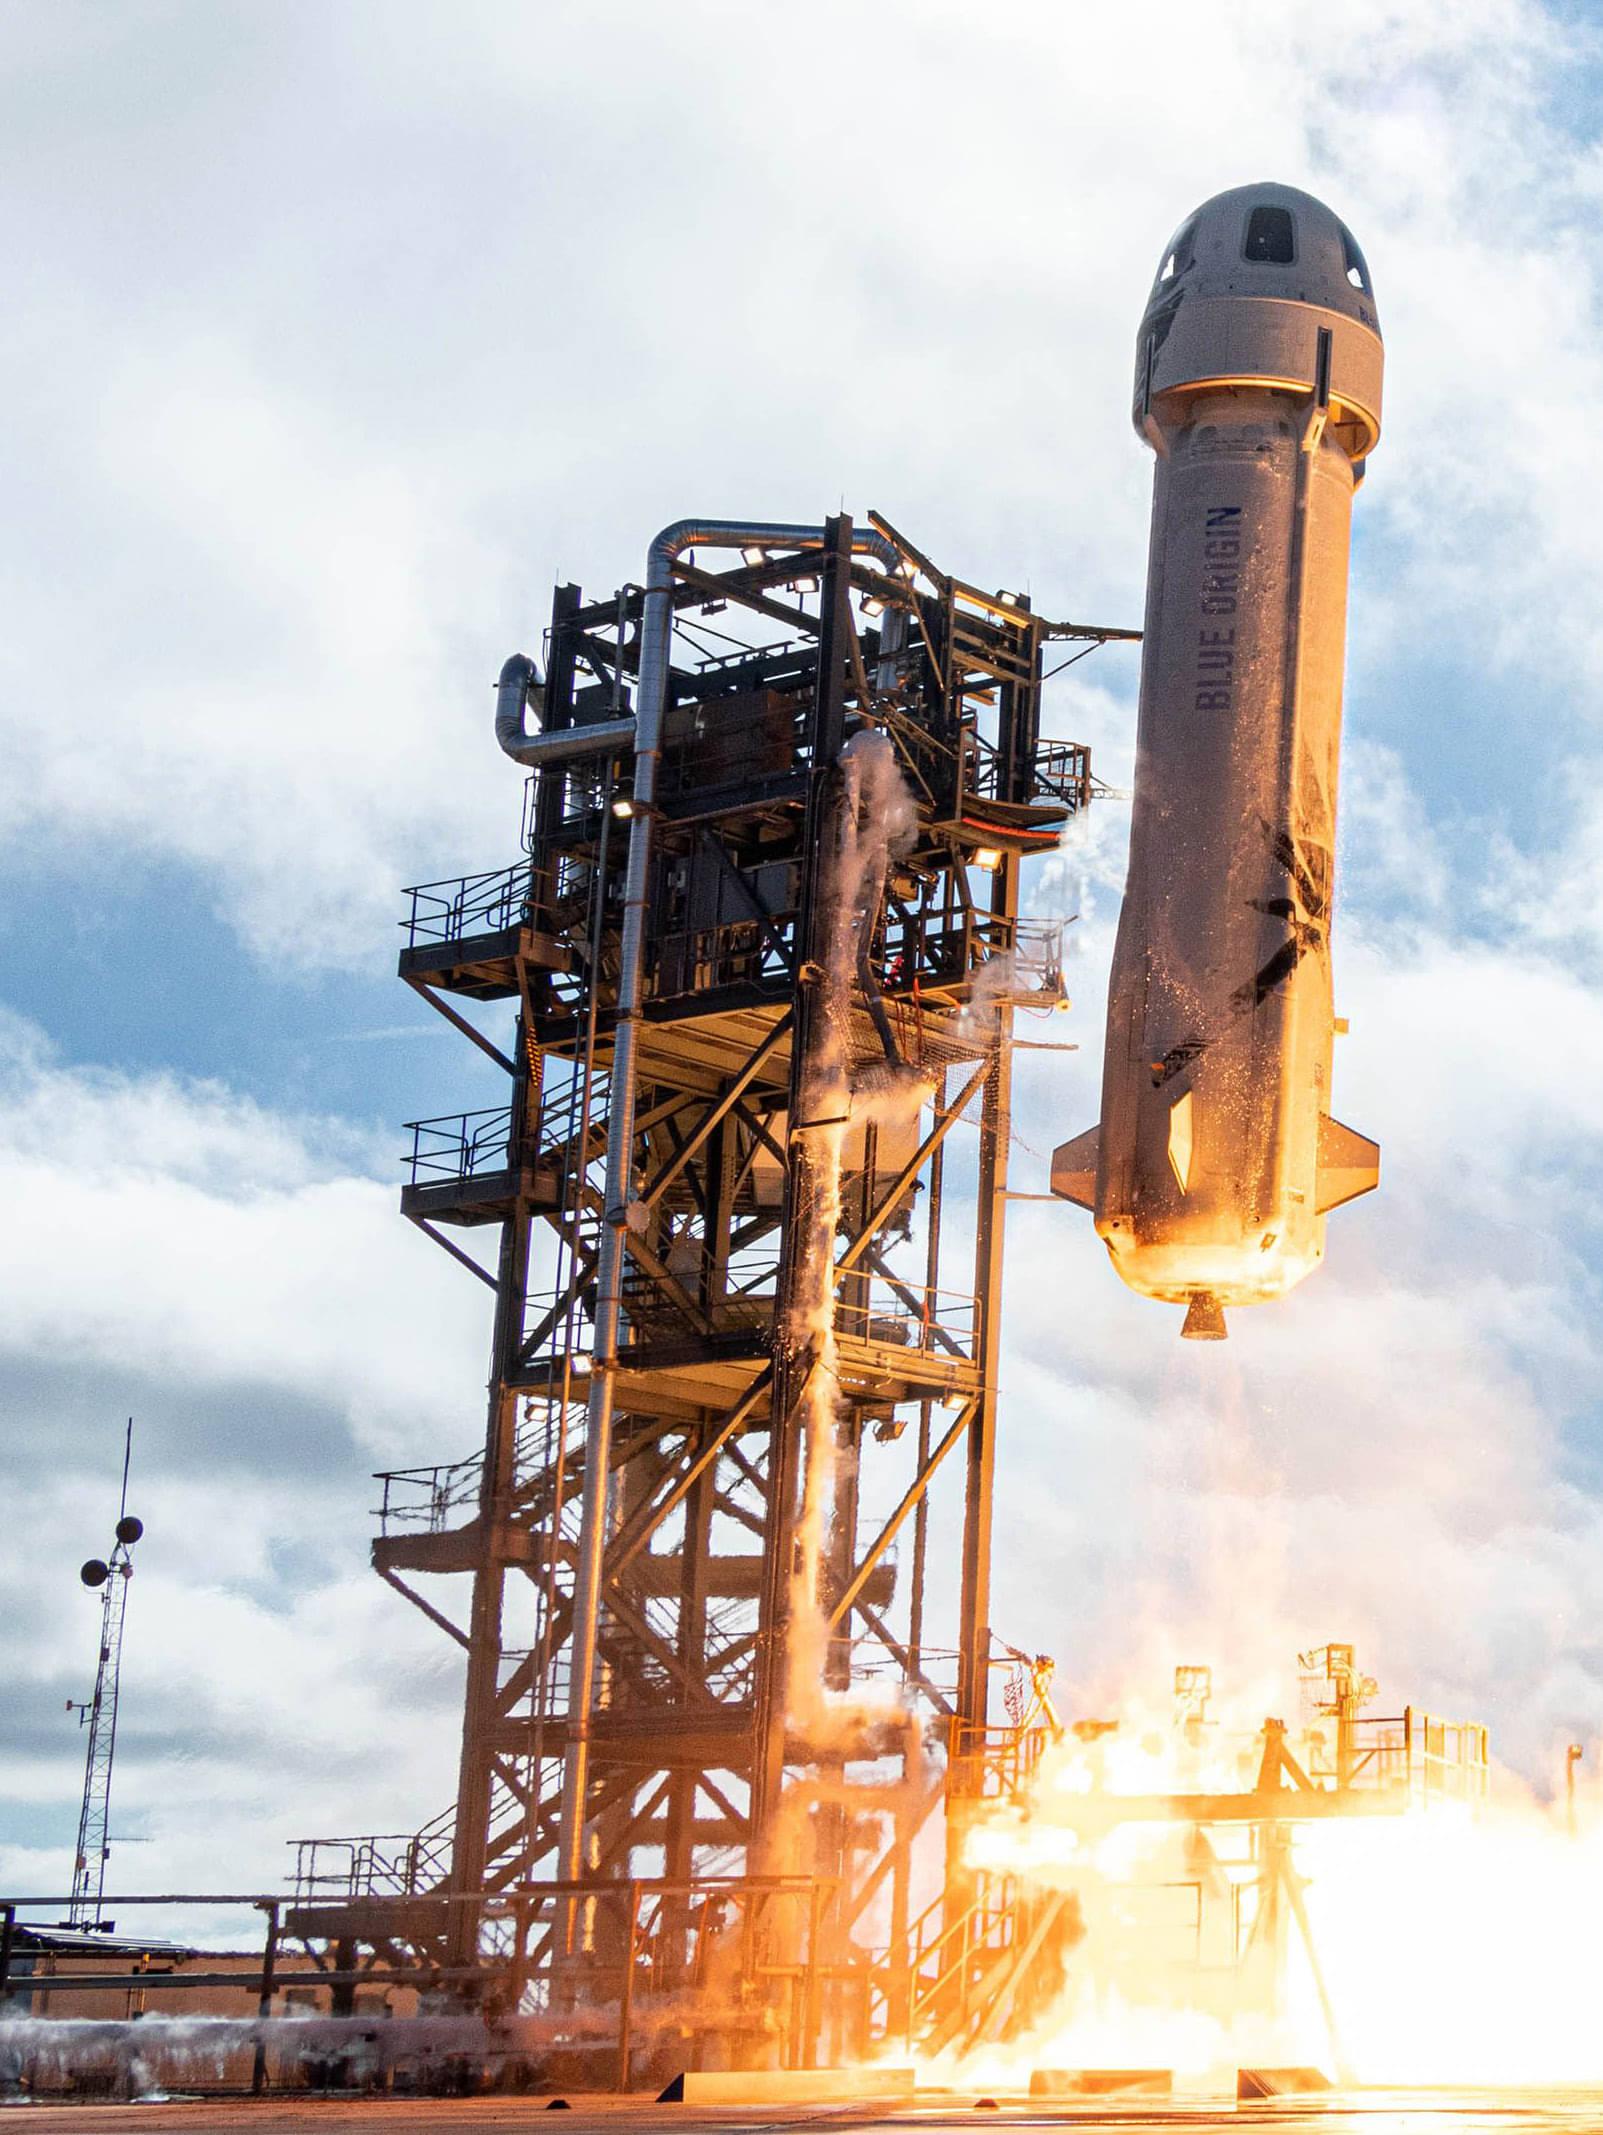 NASA MOON-LANDING TECH HITCHES RIDE TO SPACE ON BEZOS ROCKET